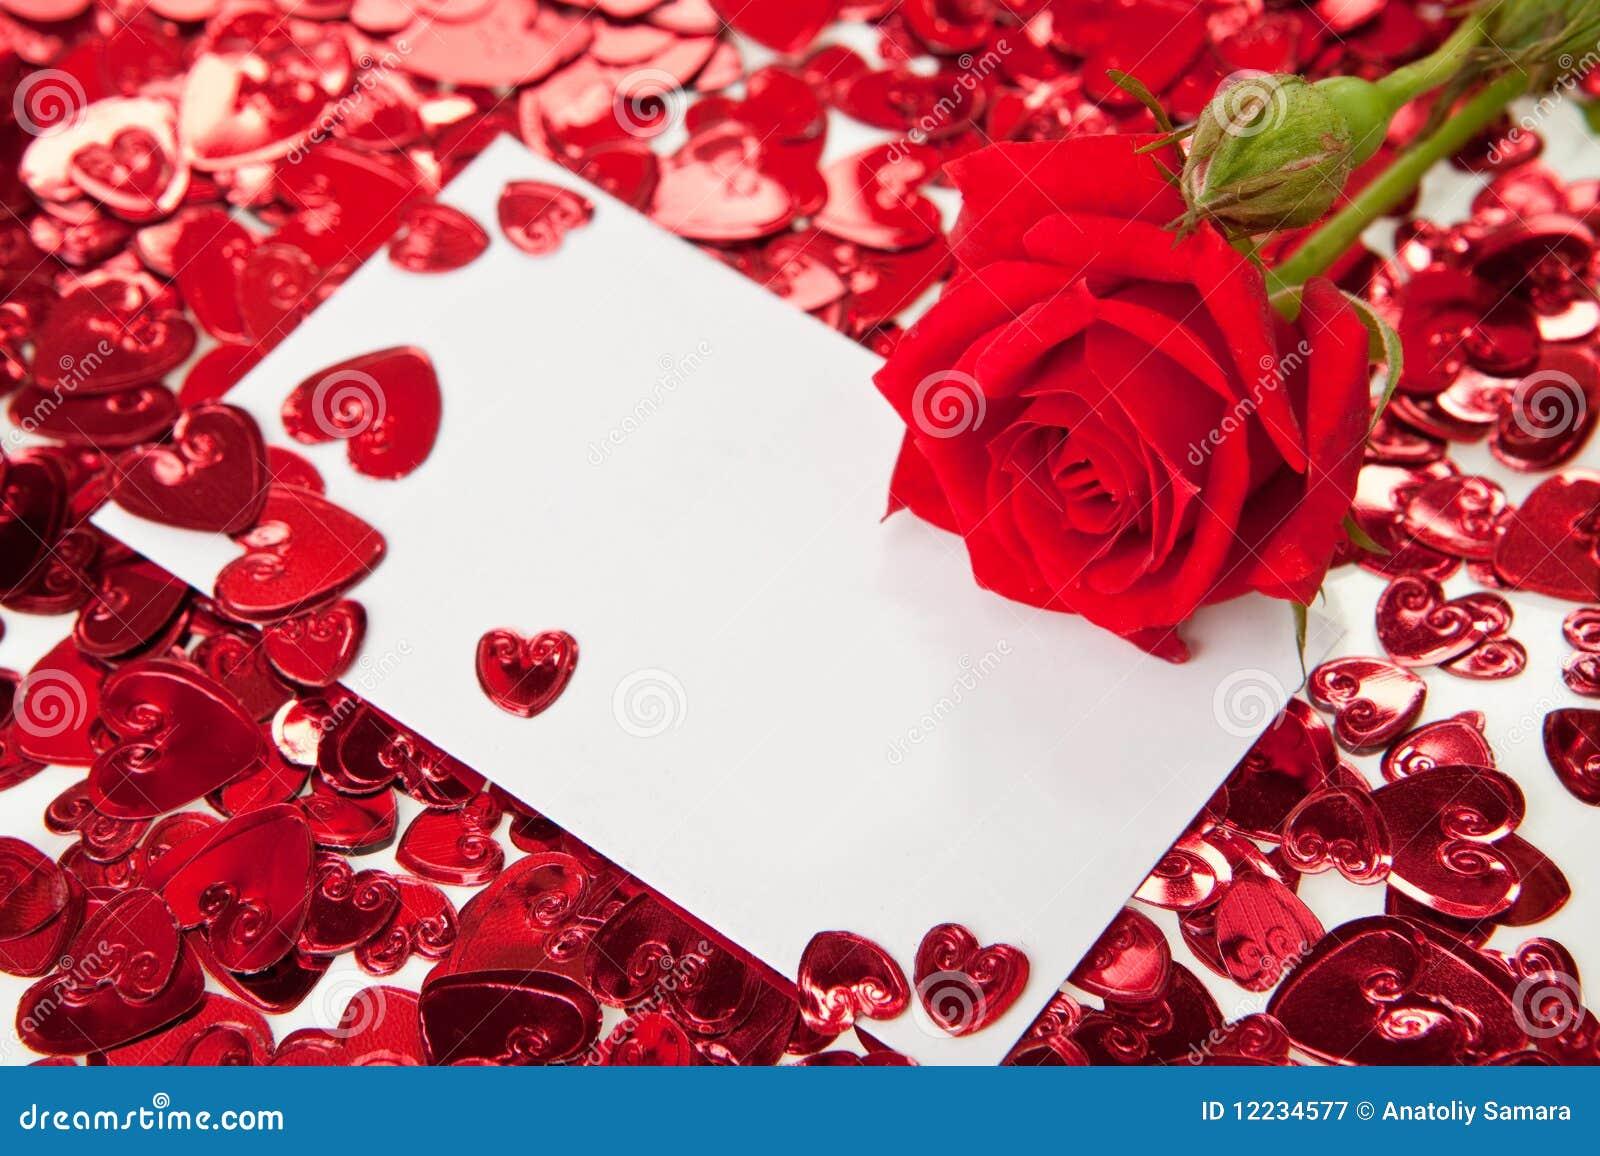 red invitation blank templates | datariouruguay